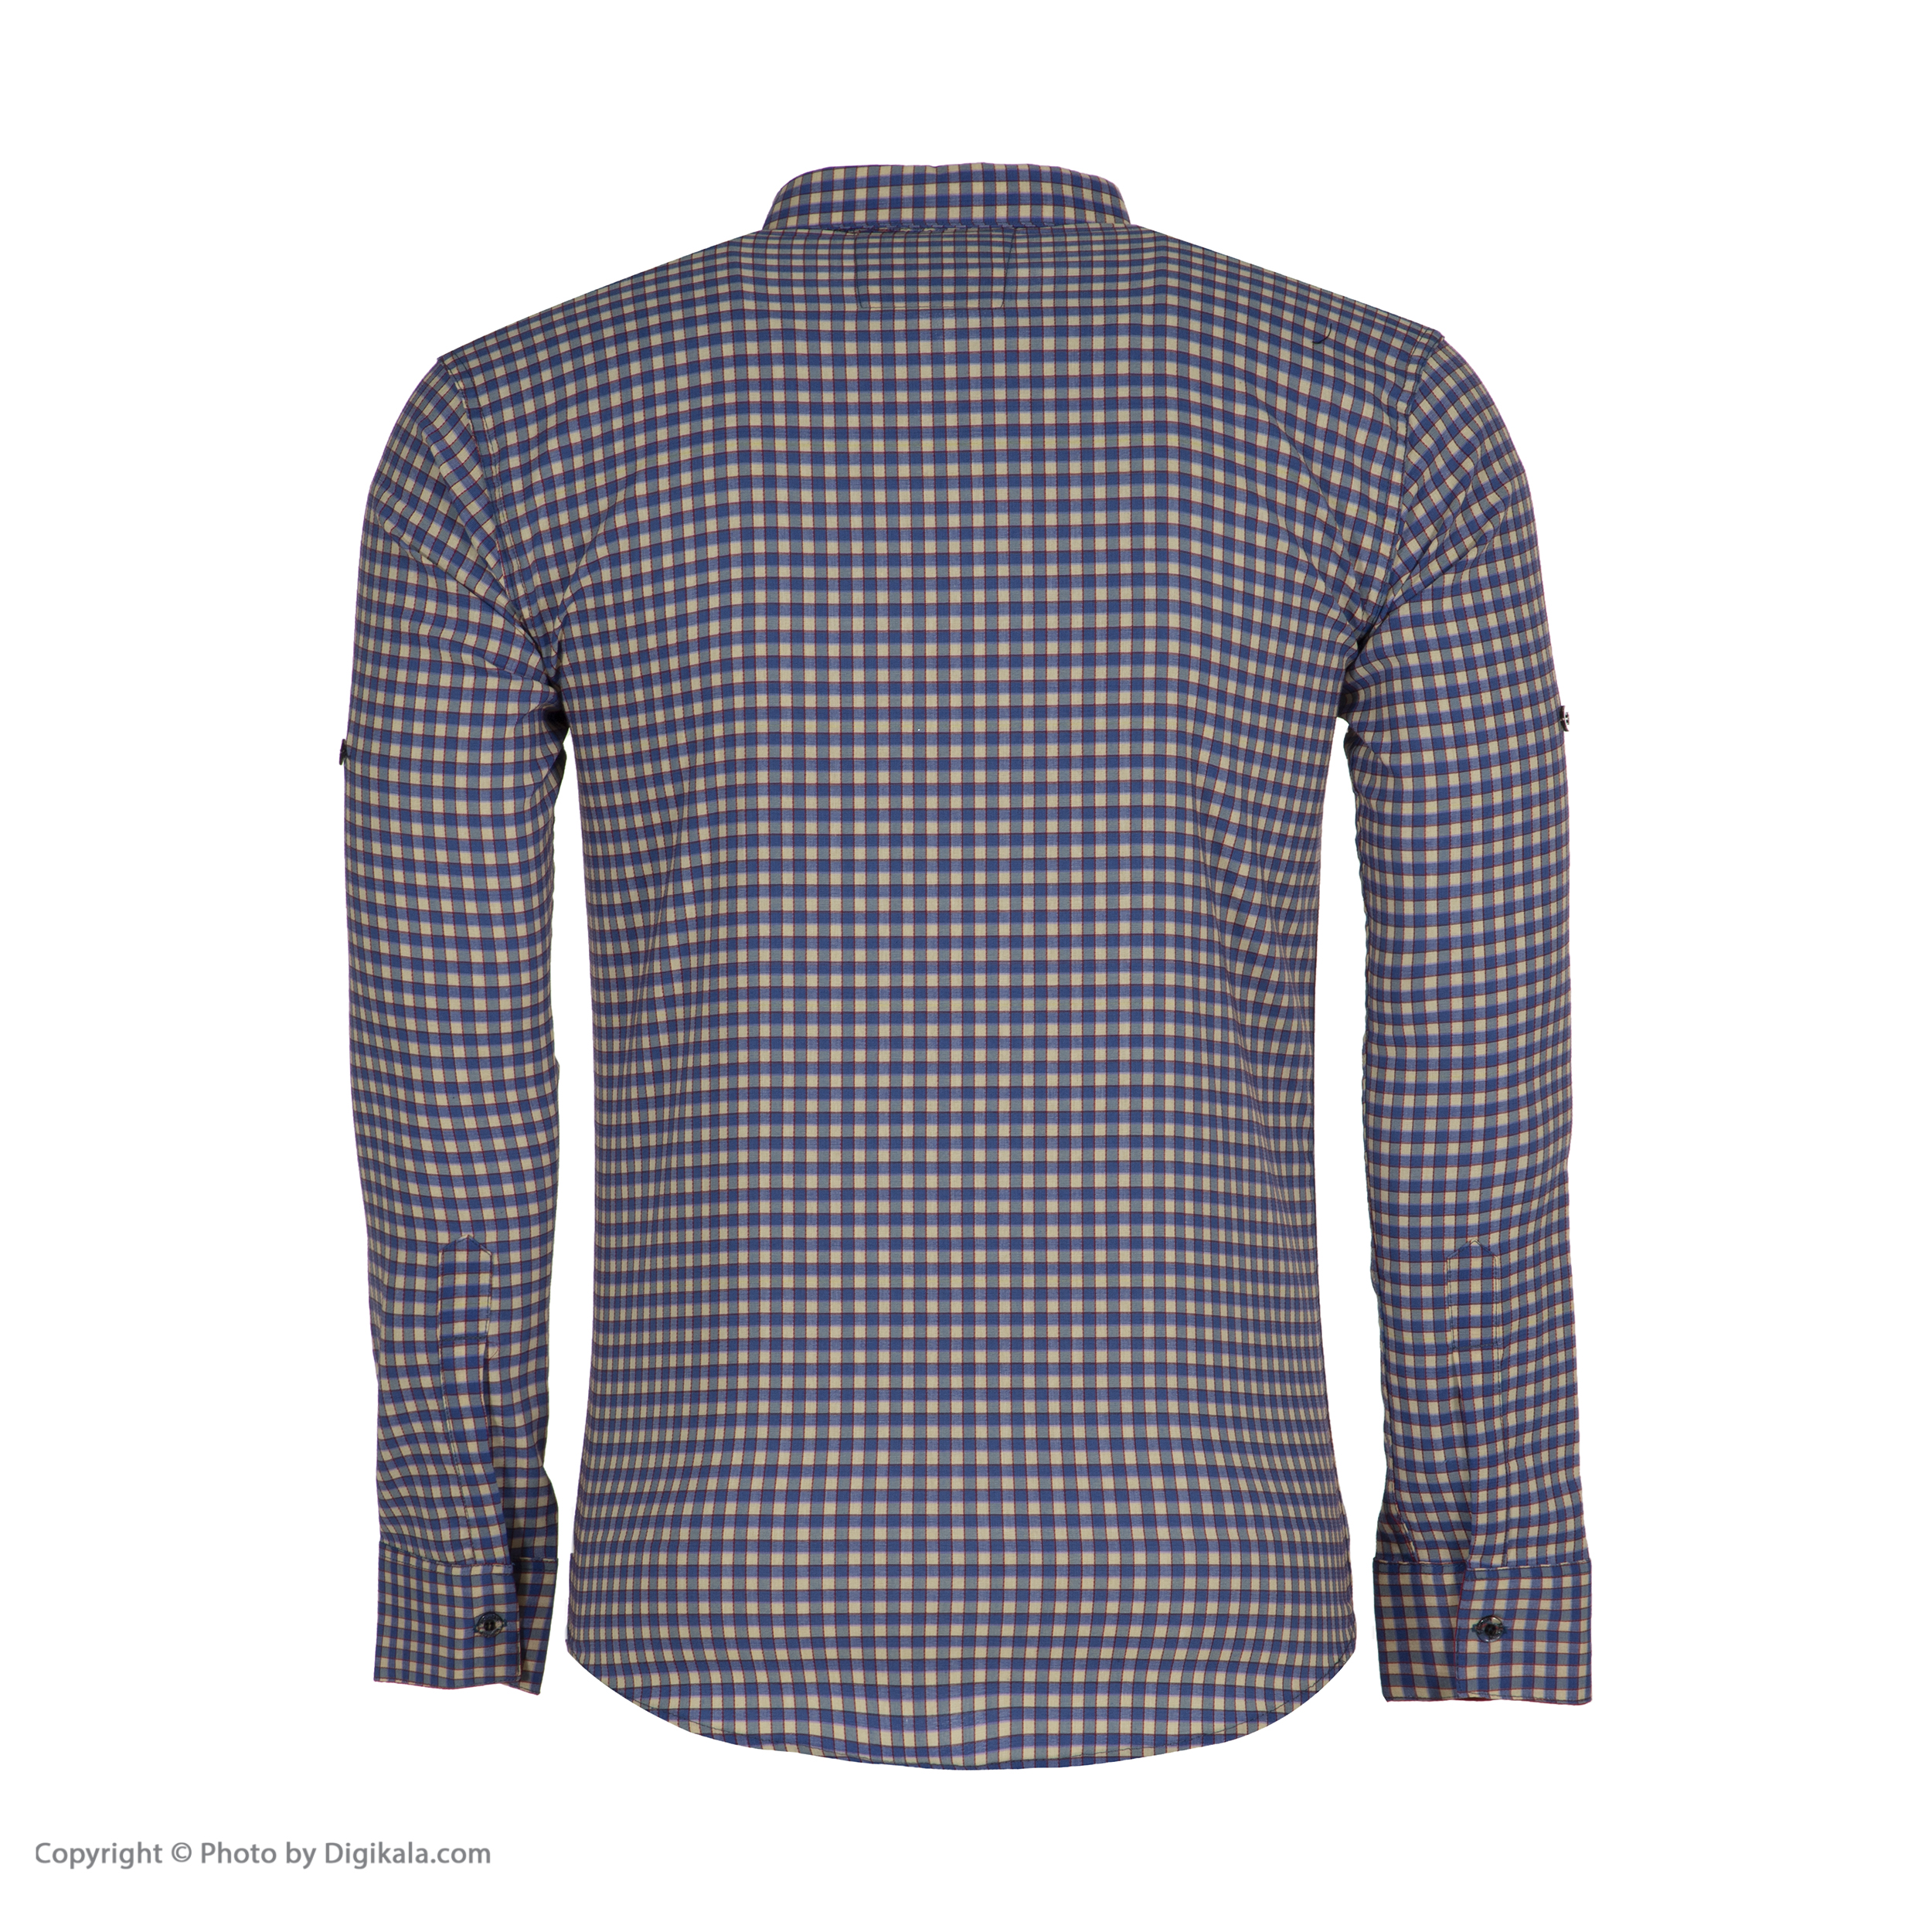 پیراهن مردانه کد M02284